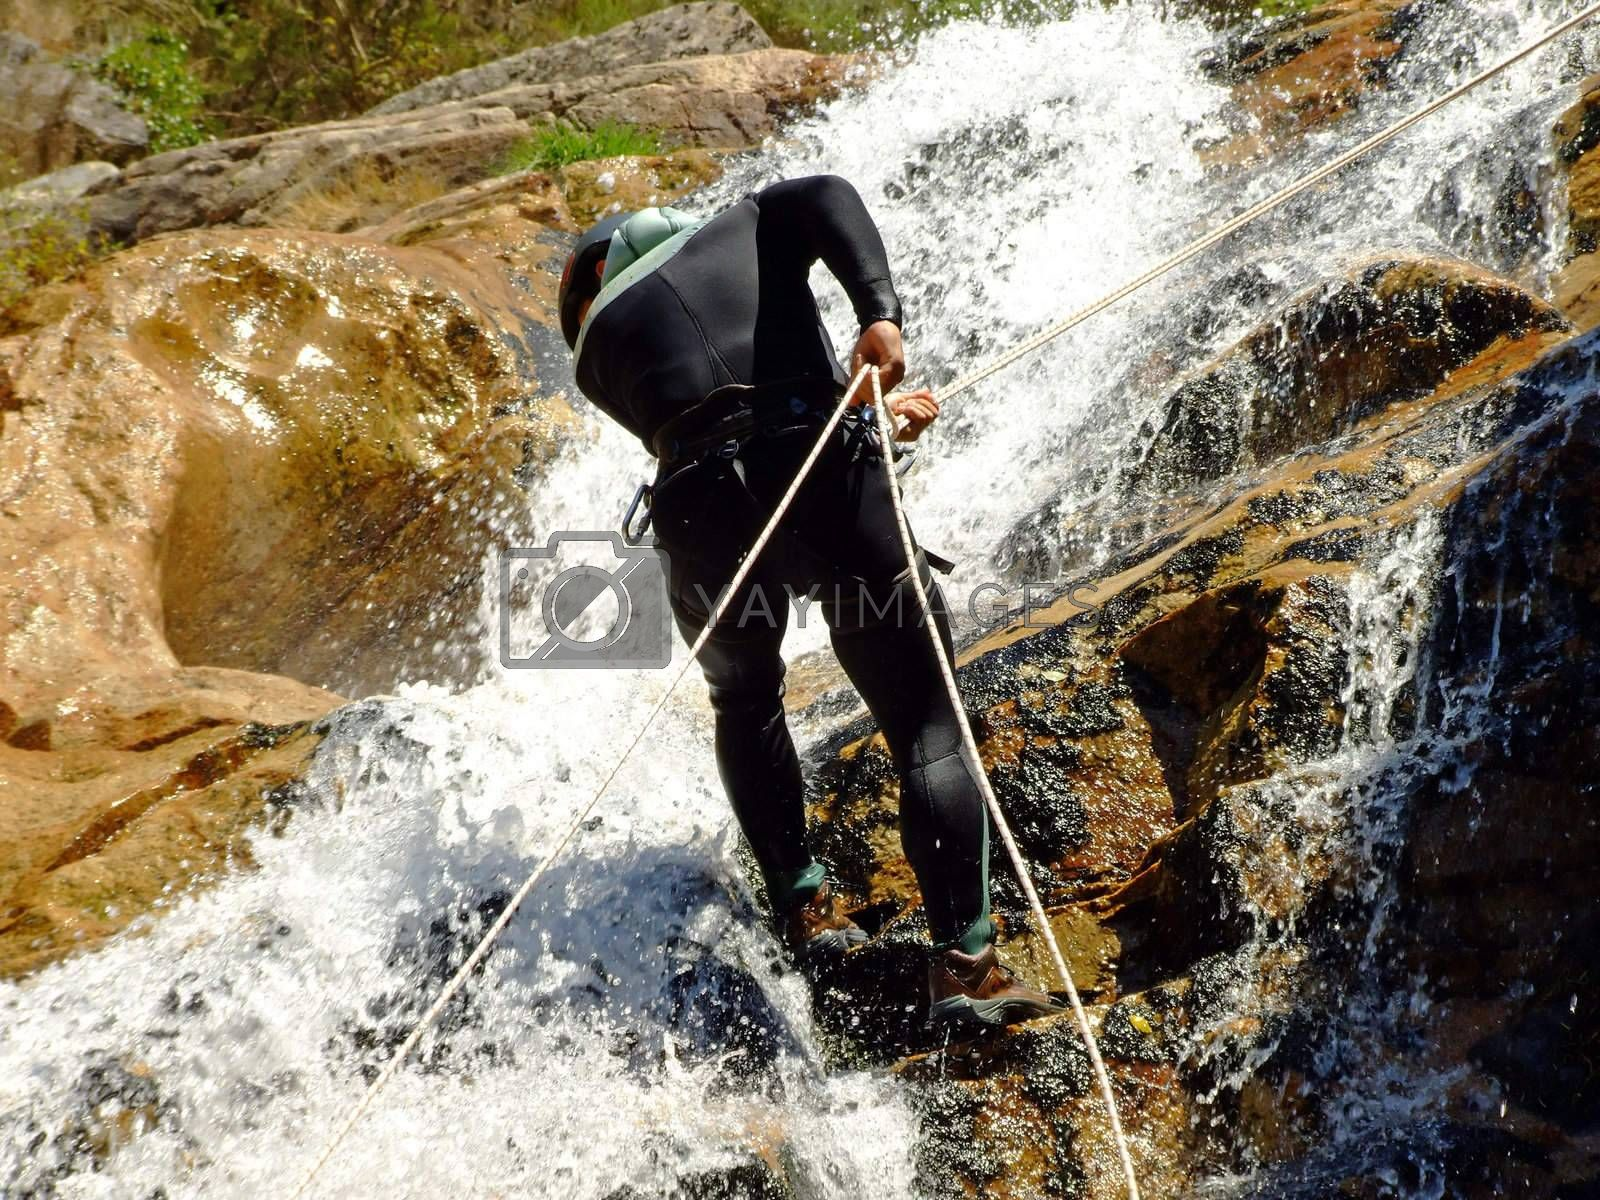 Men descending on rappel by PauloResende